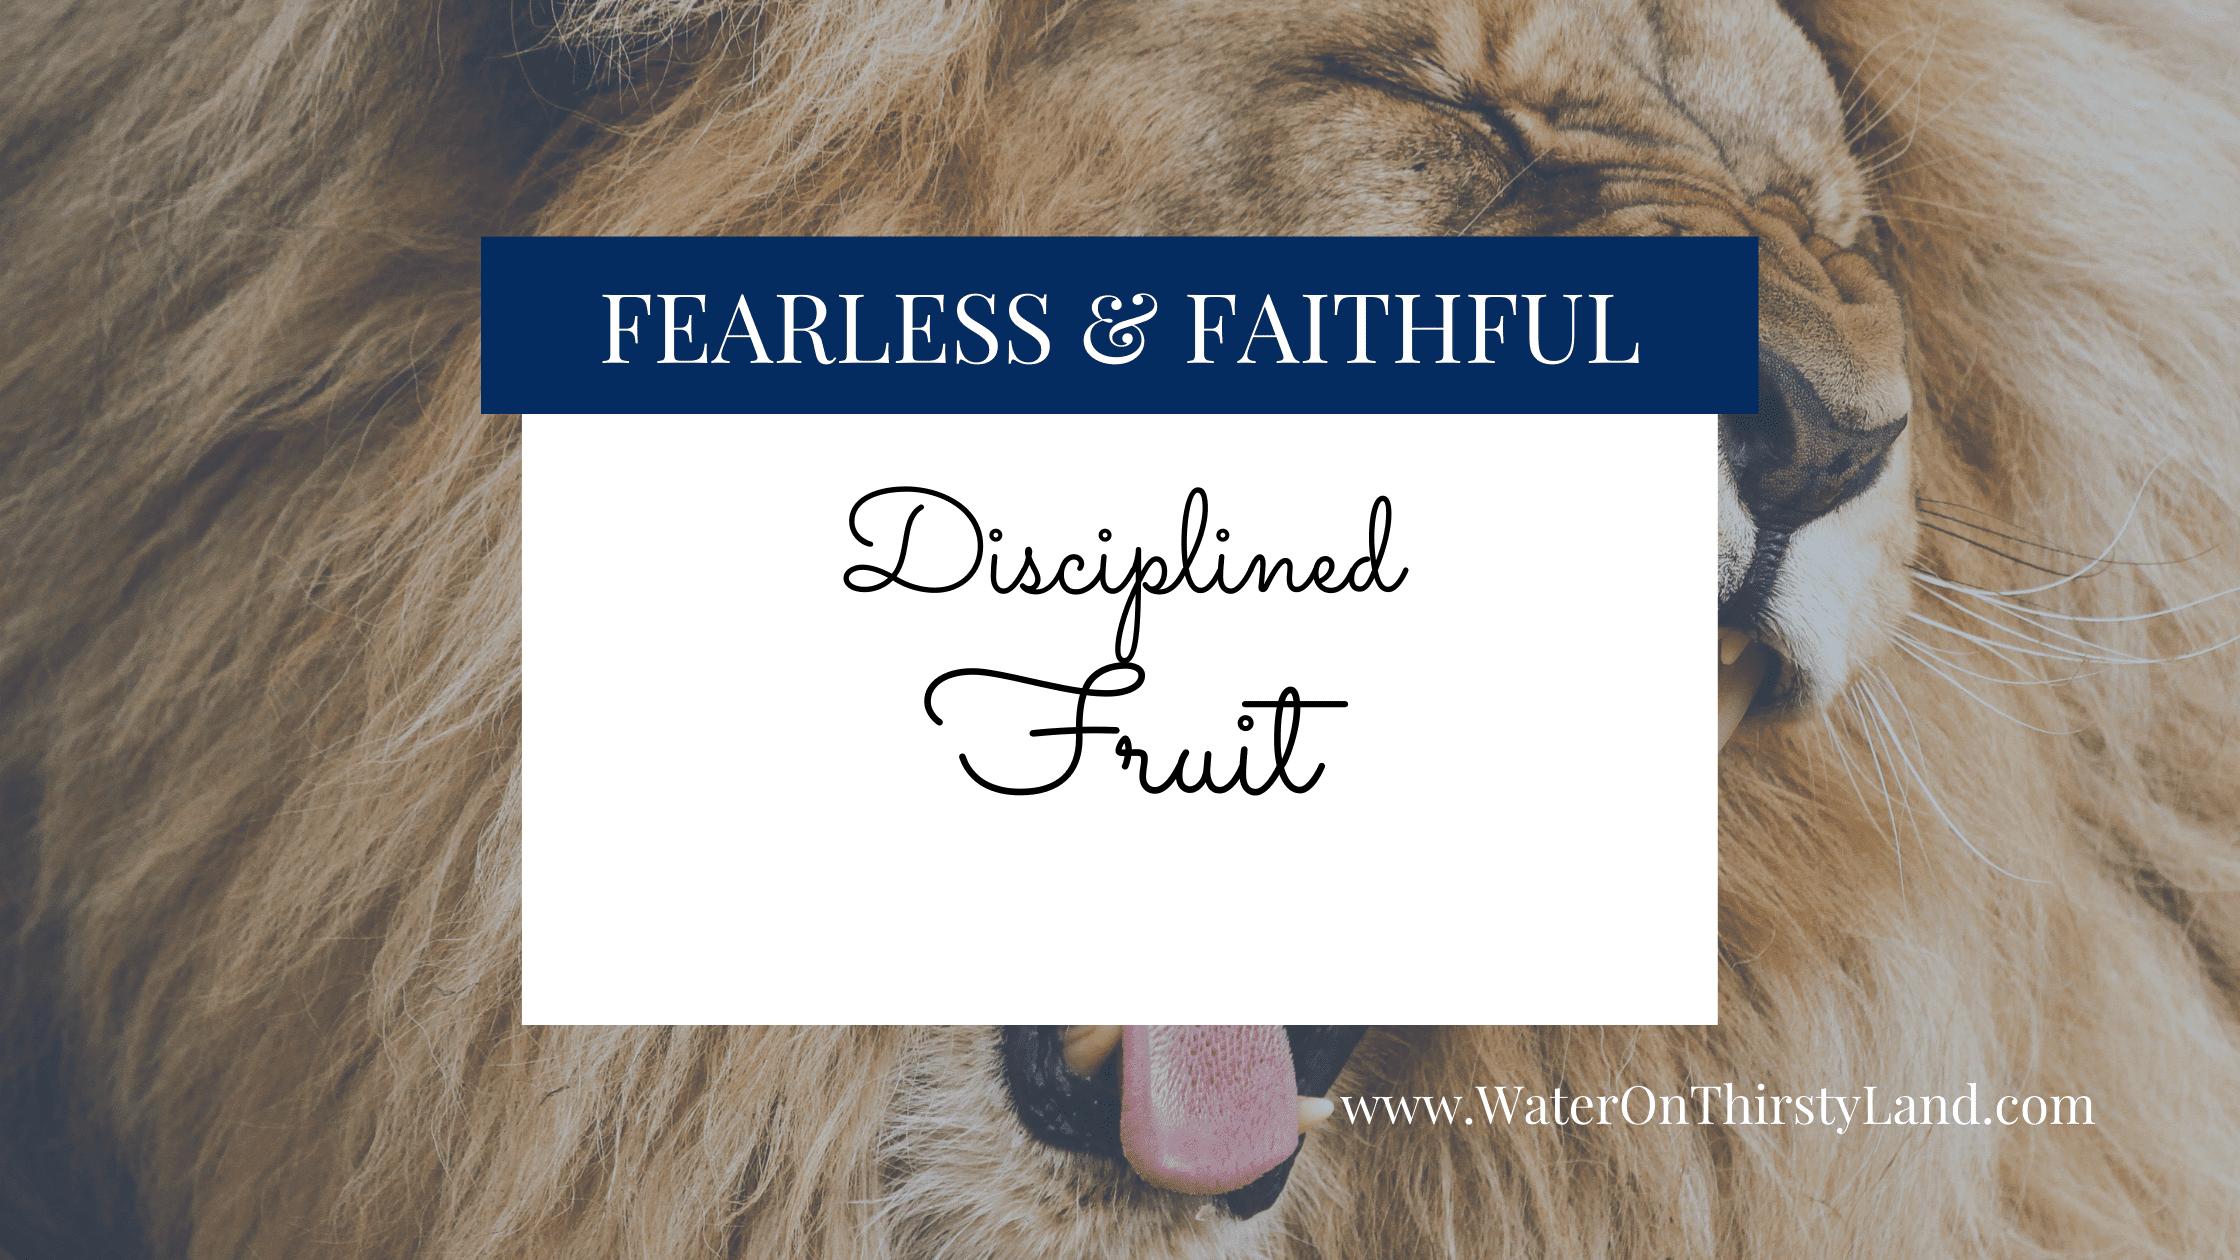 Disciplined Fruit